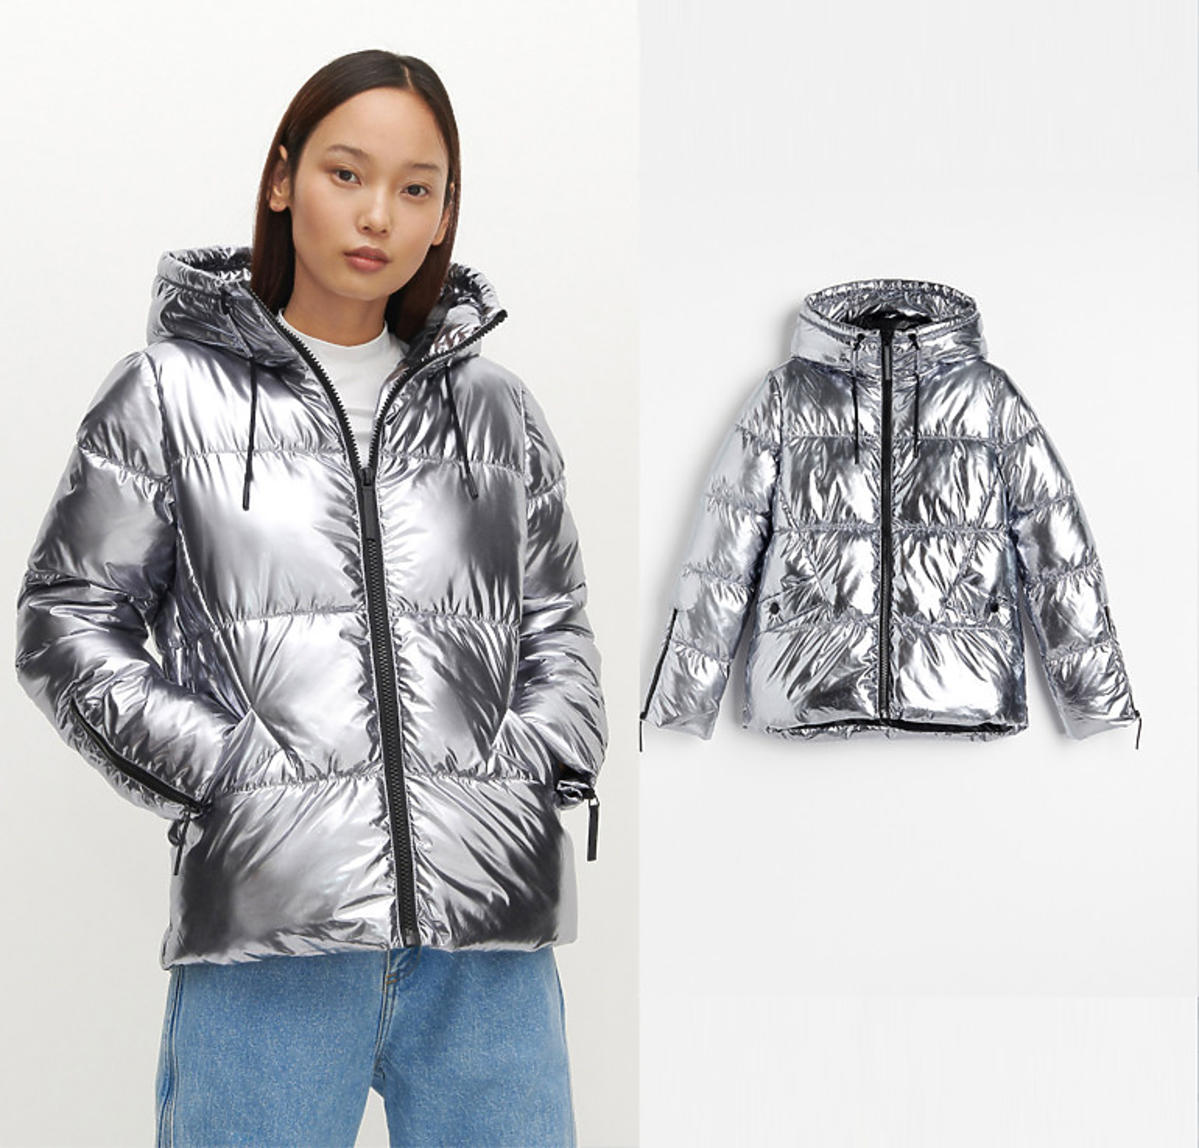 Srebrna kurtka na jesień i zimę 2020, Reserved